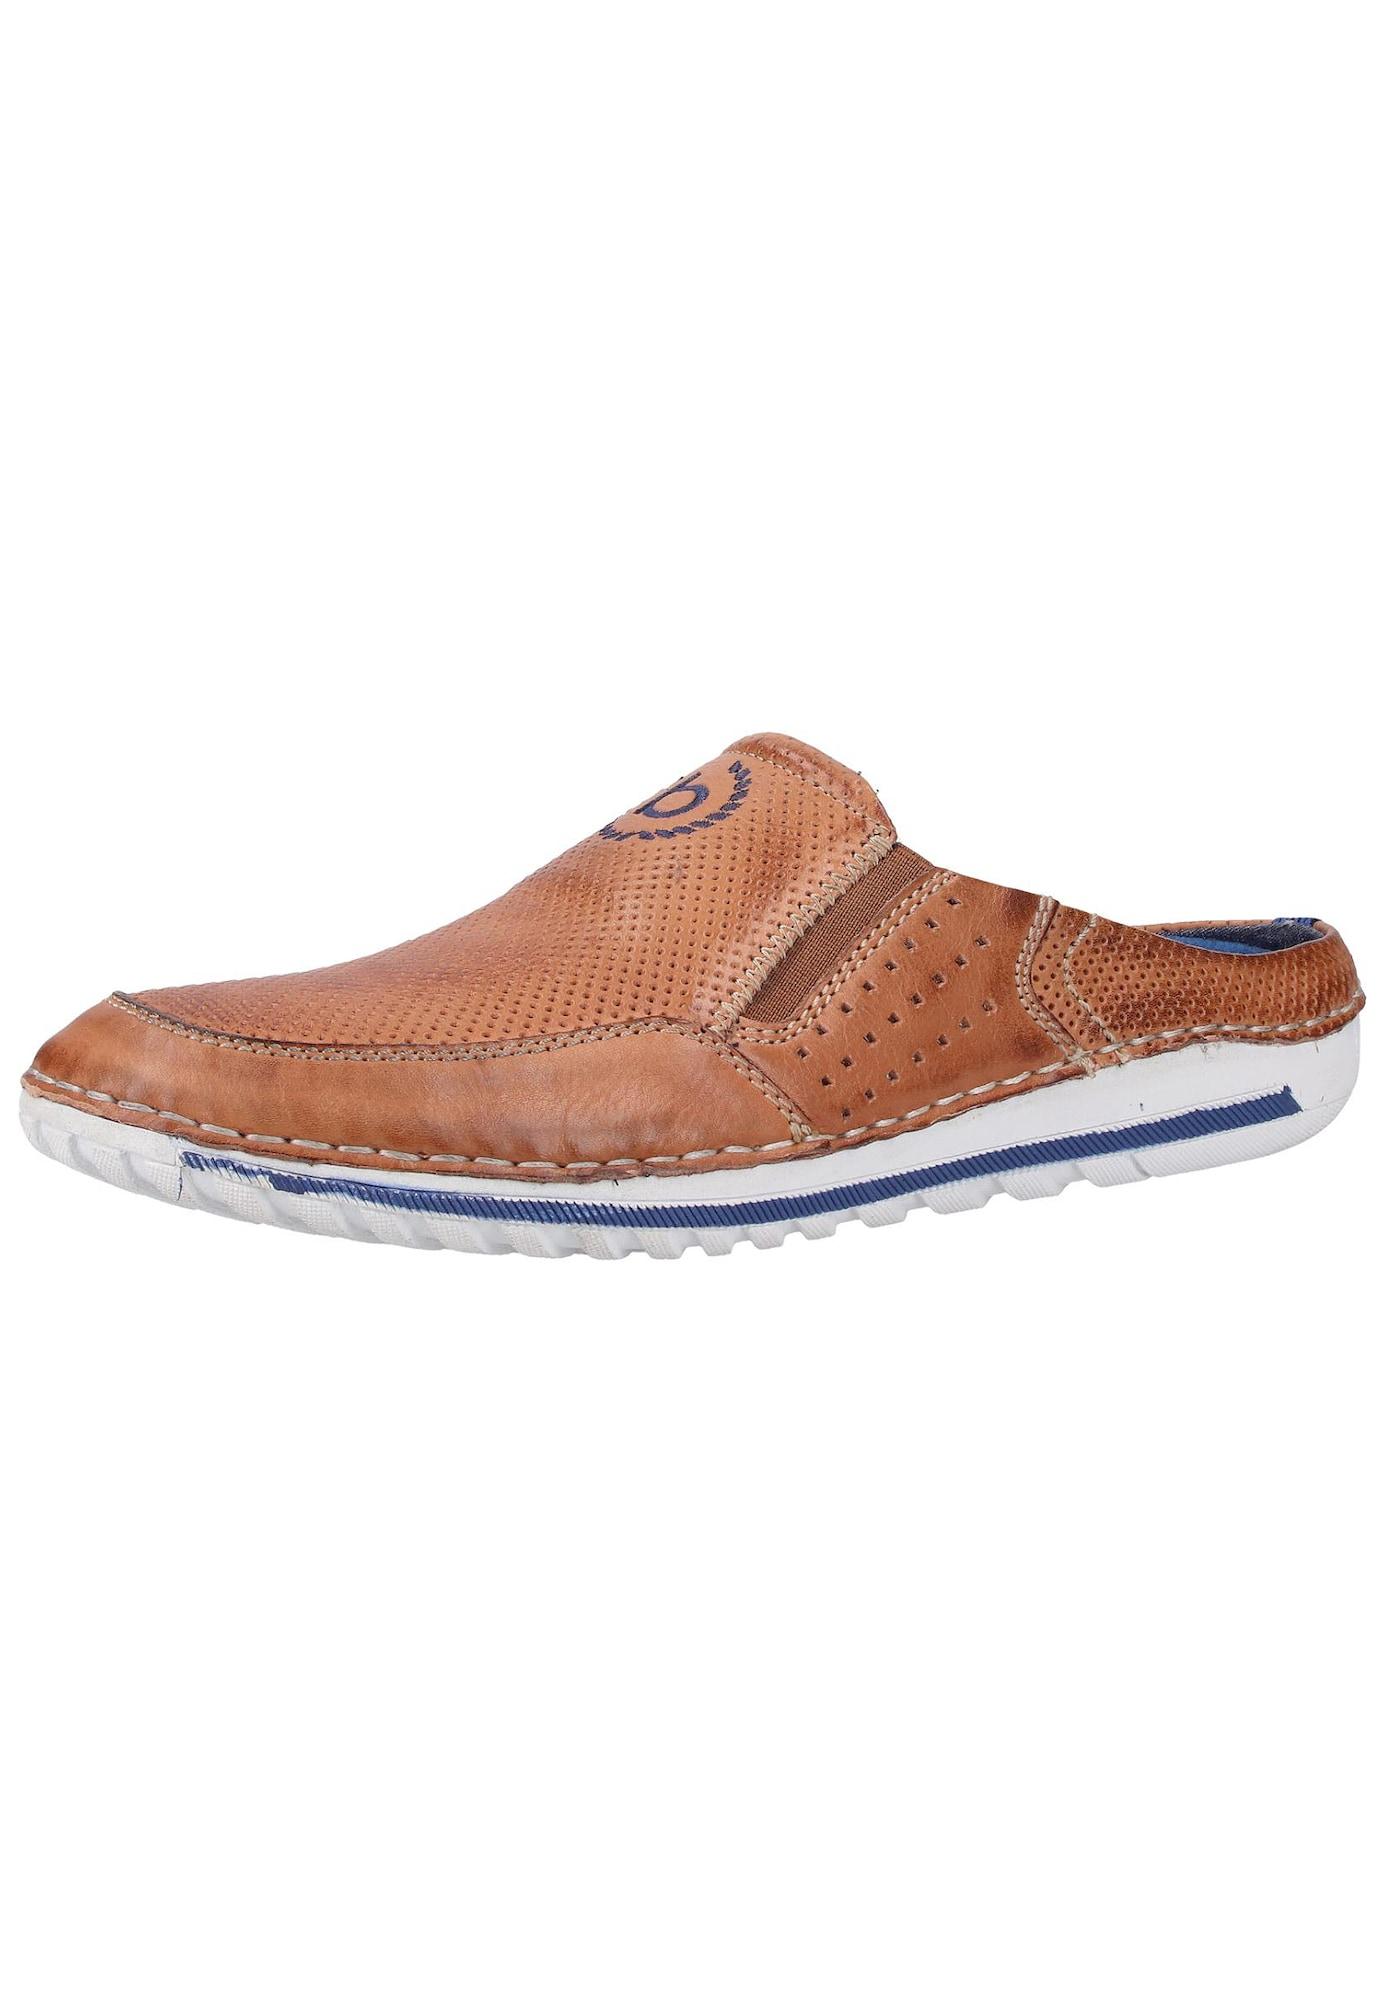 Clogs | Schuhe > Clogs & Pantoletten > Clogs | Cognac | Bugatti